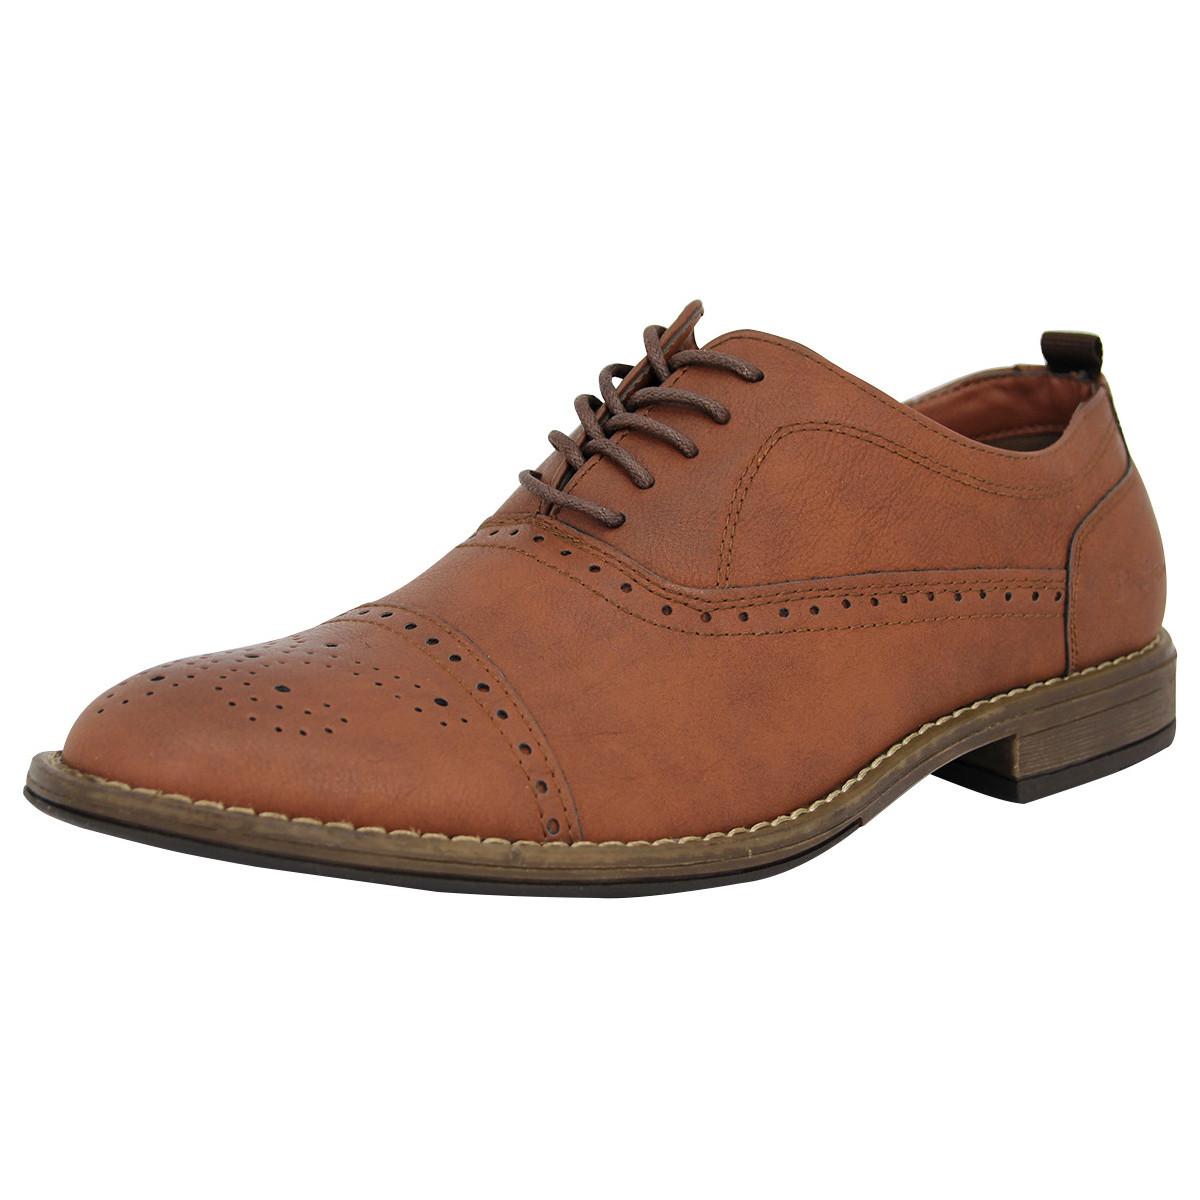 Ben Sherman 4 EYE FASHION BROGUE Leder Herren Strassenschuhe Neu braunben3157 - Schuhe Richelieu Herren 39,90 €